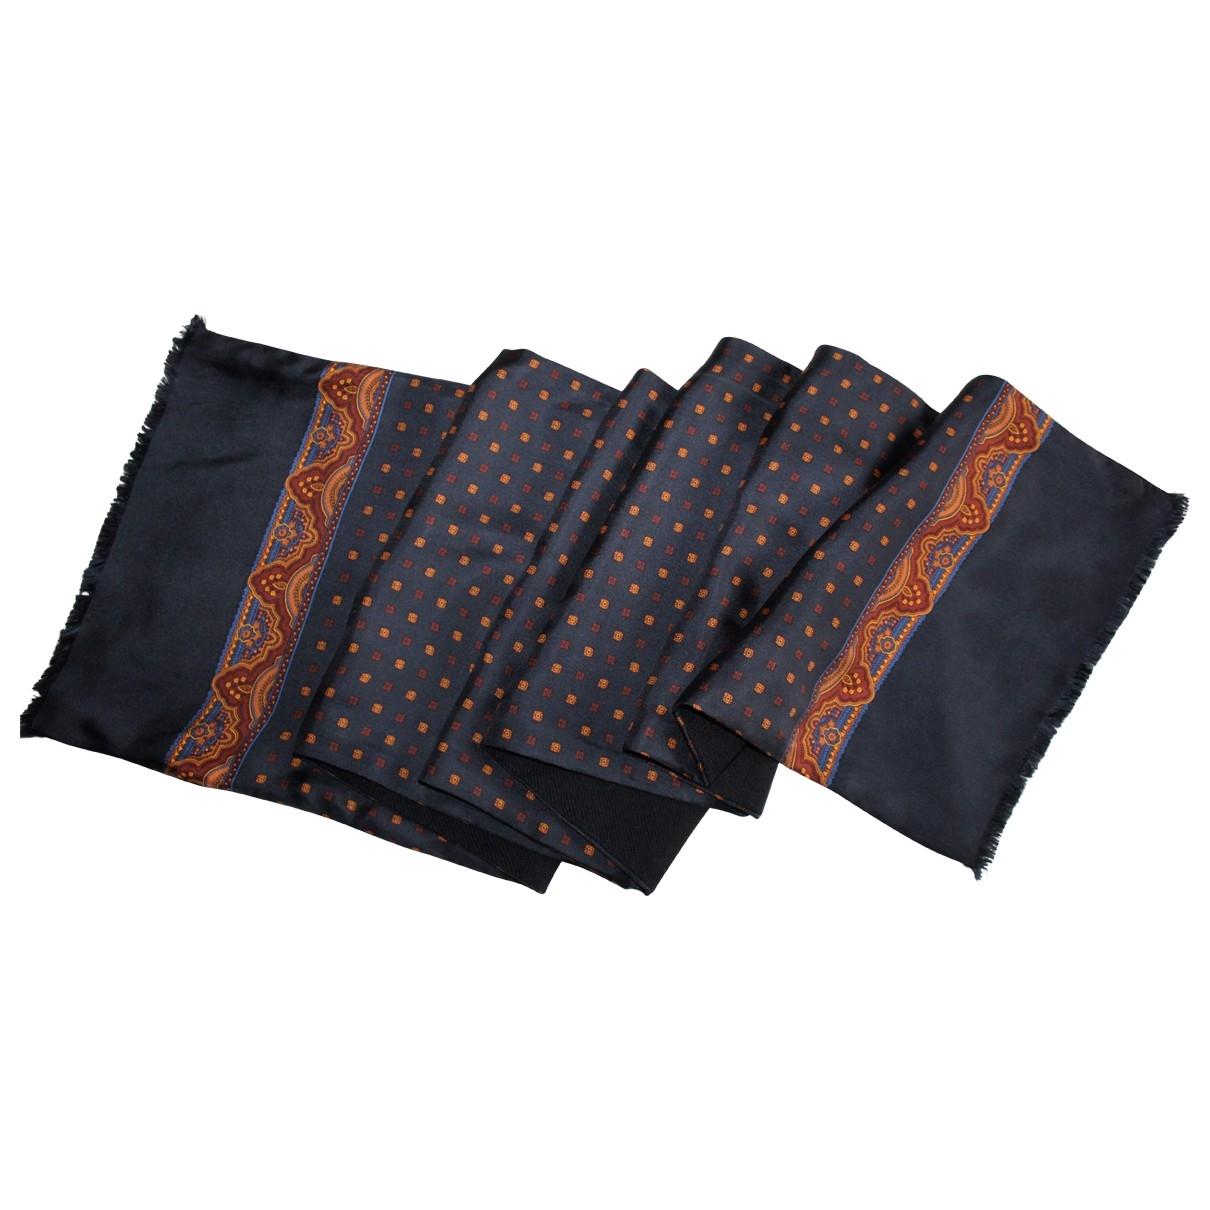 Pañuelo / bufanda de Seda Luciano Barbera